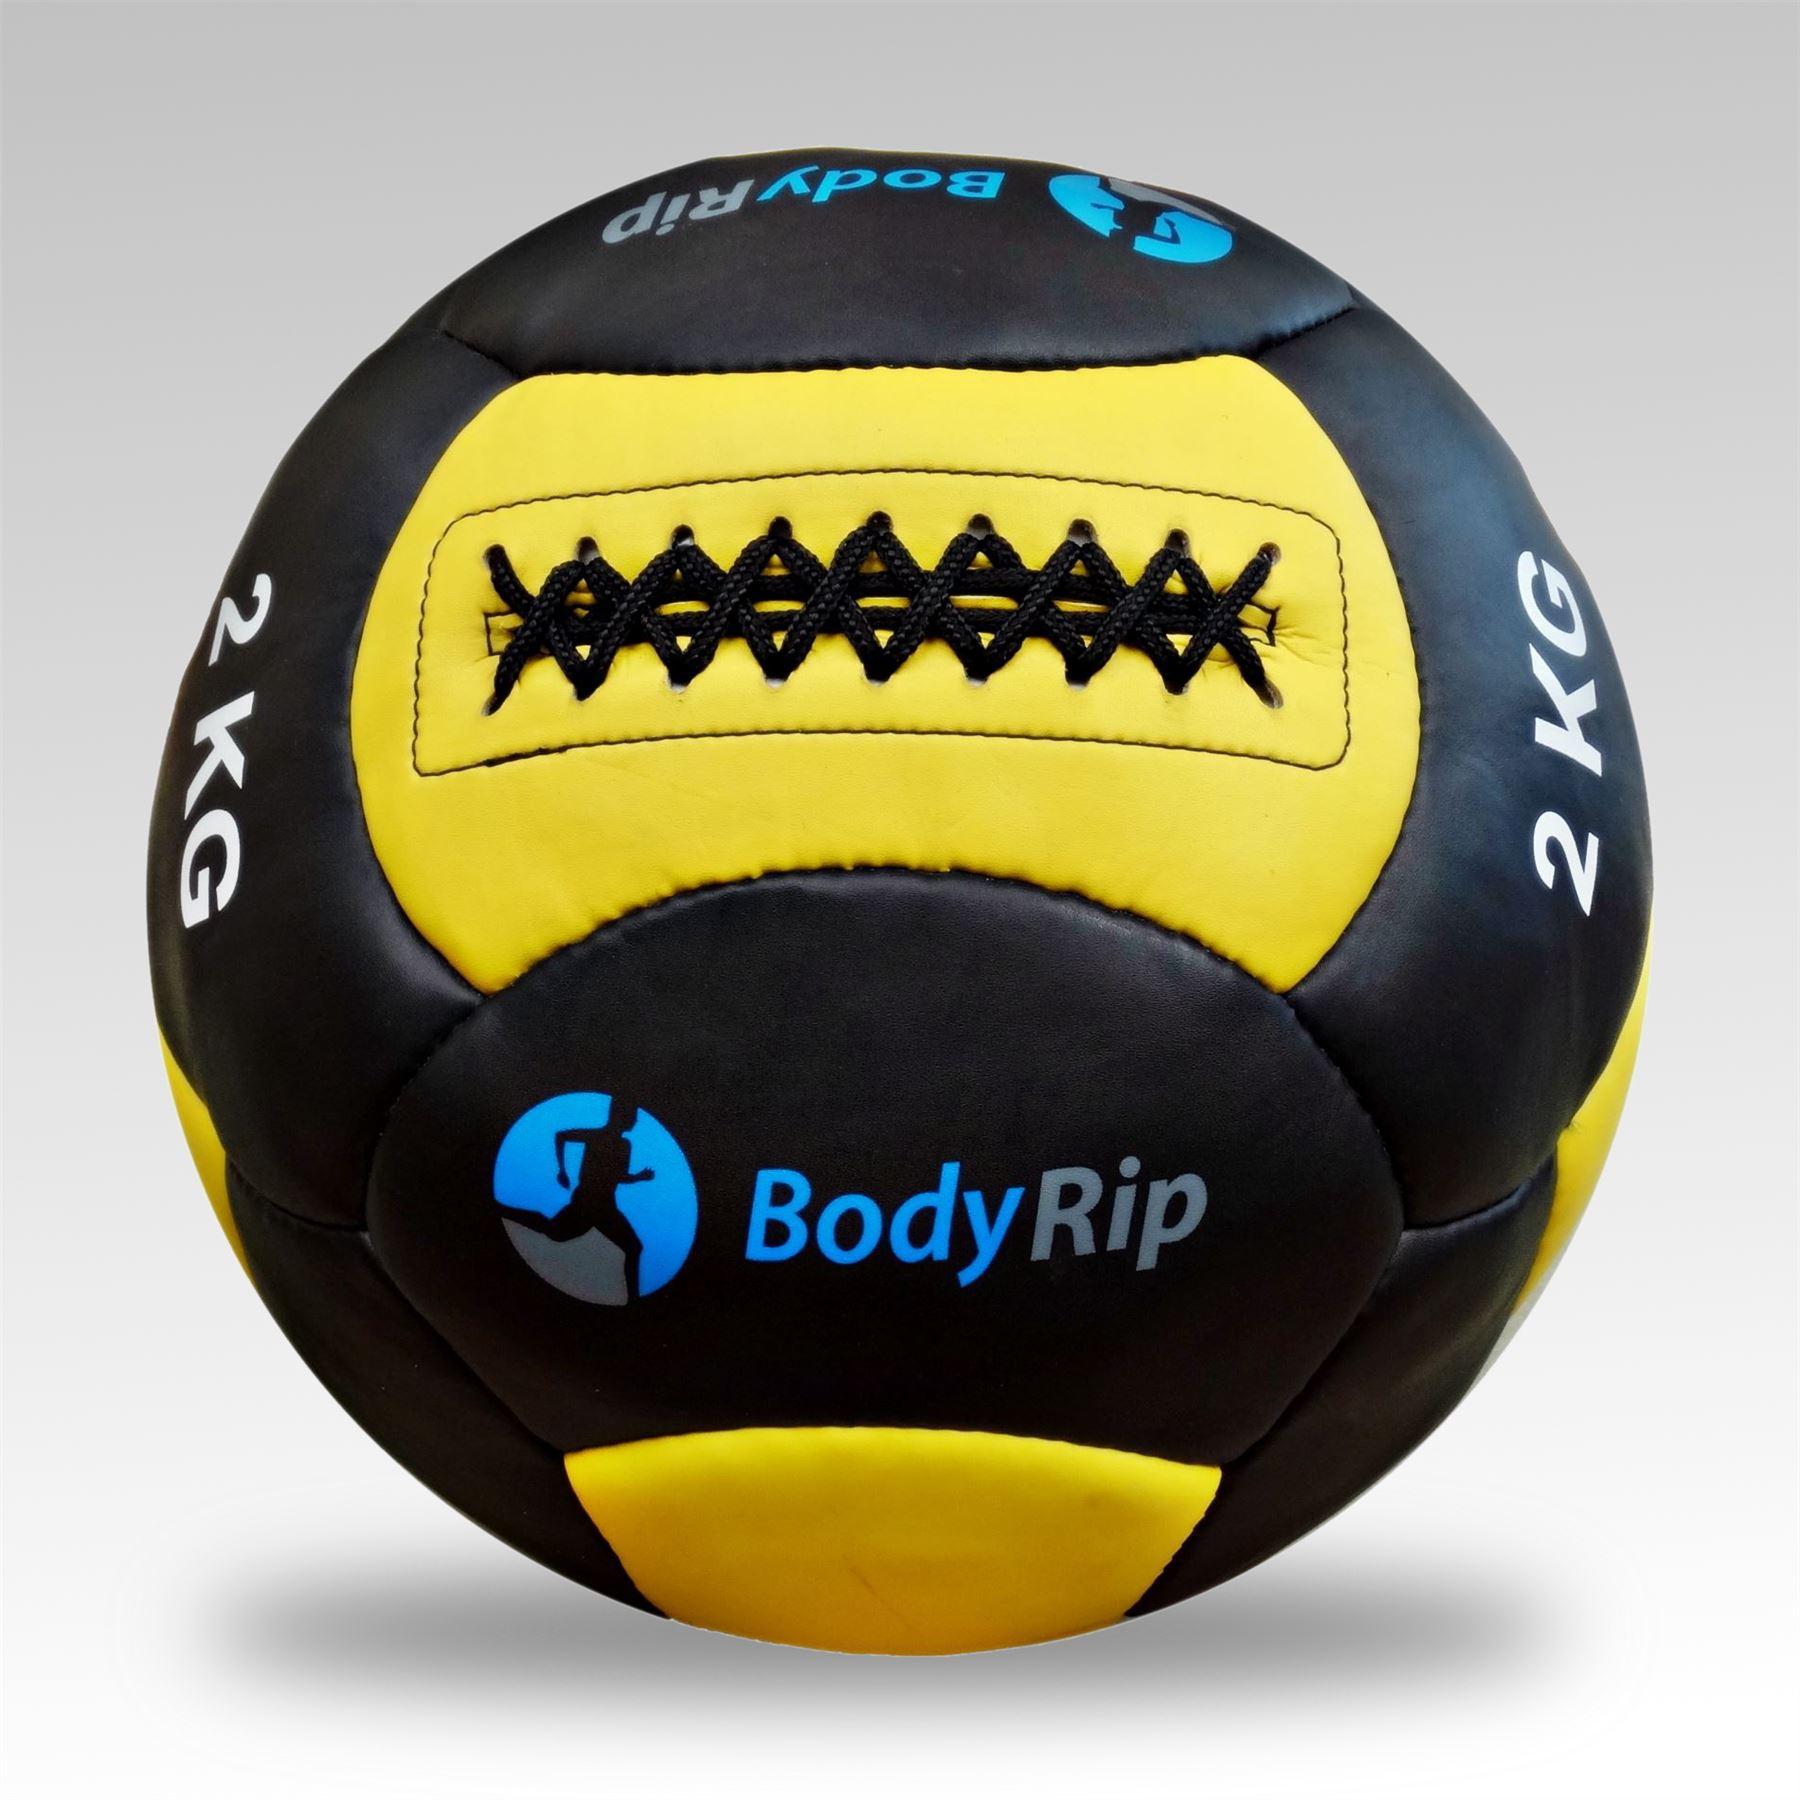 Reactor Rubber Medicine Ball 3kg Yellow 1266306 Core Fitness